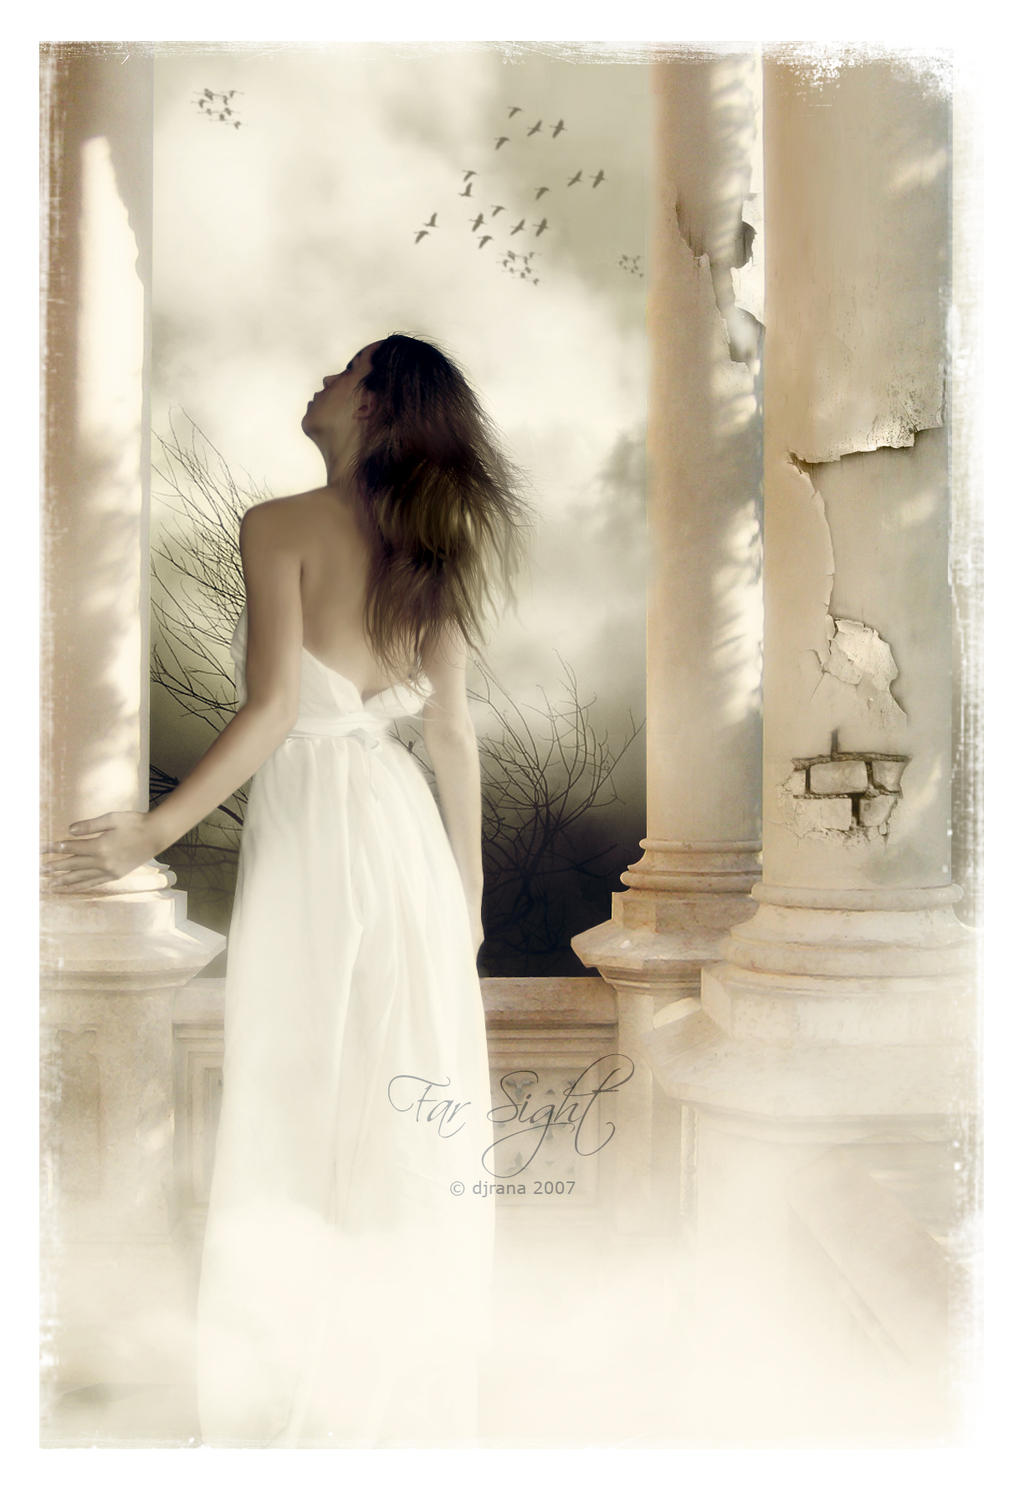 :: Far Sight :: by djrana